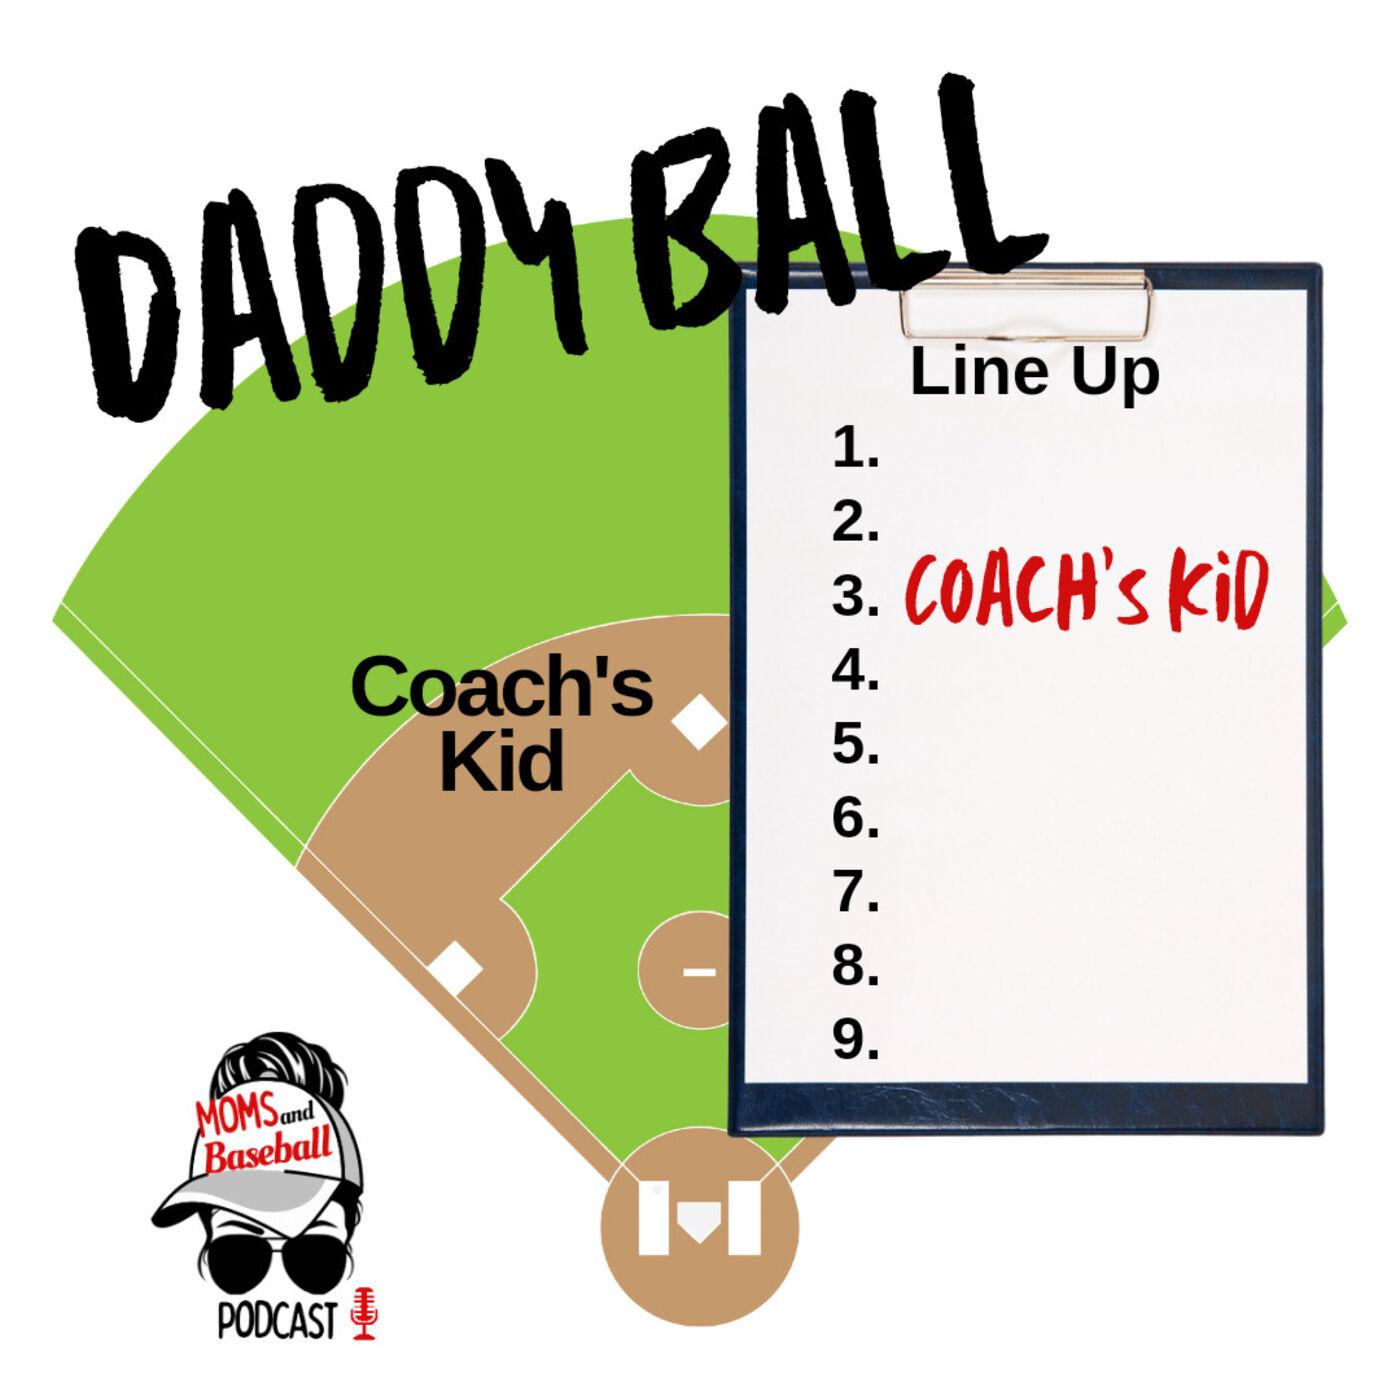 028: Daddy Ball